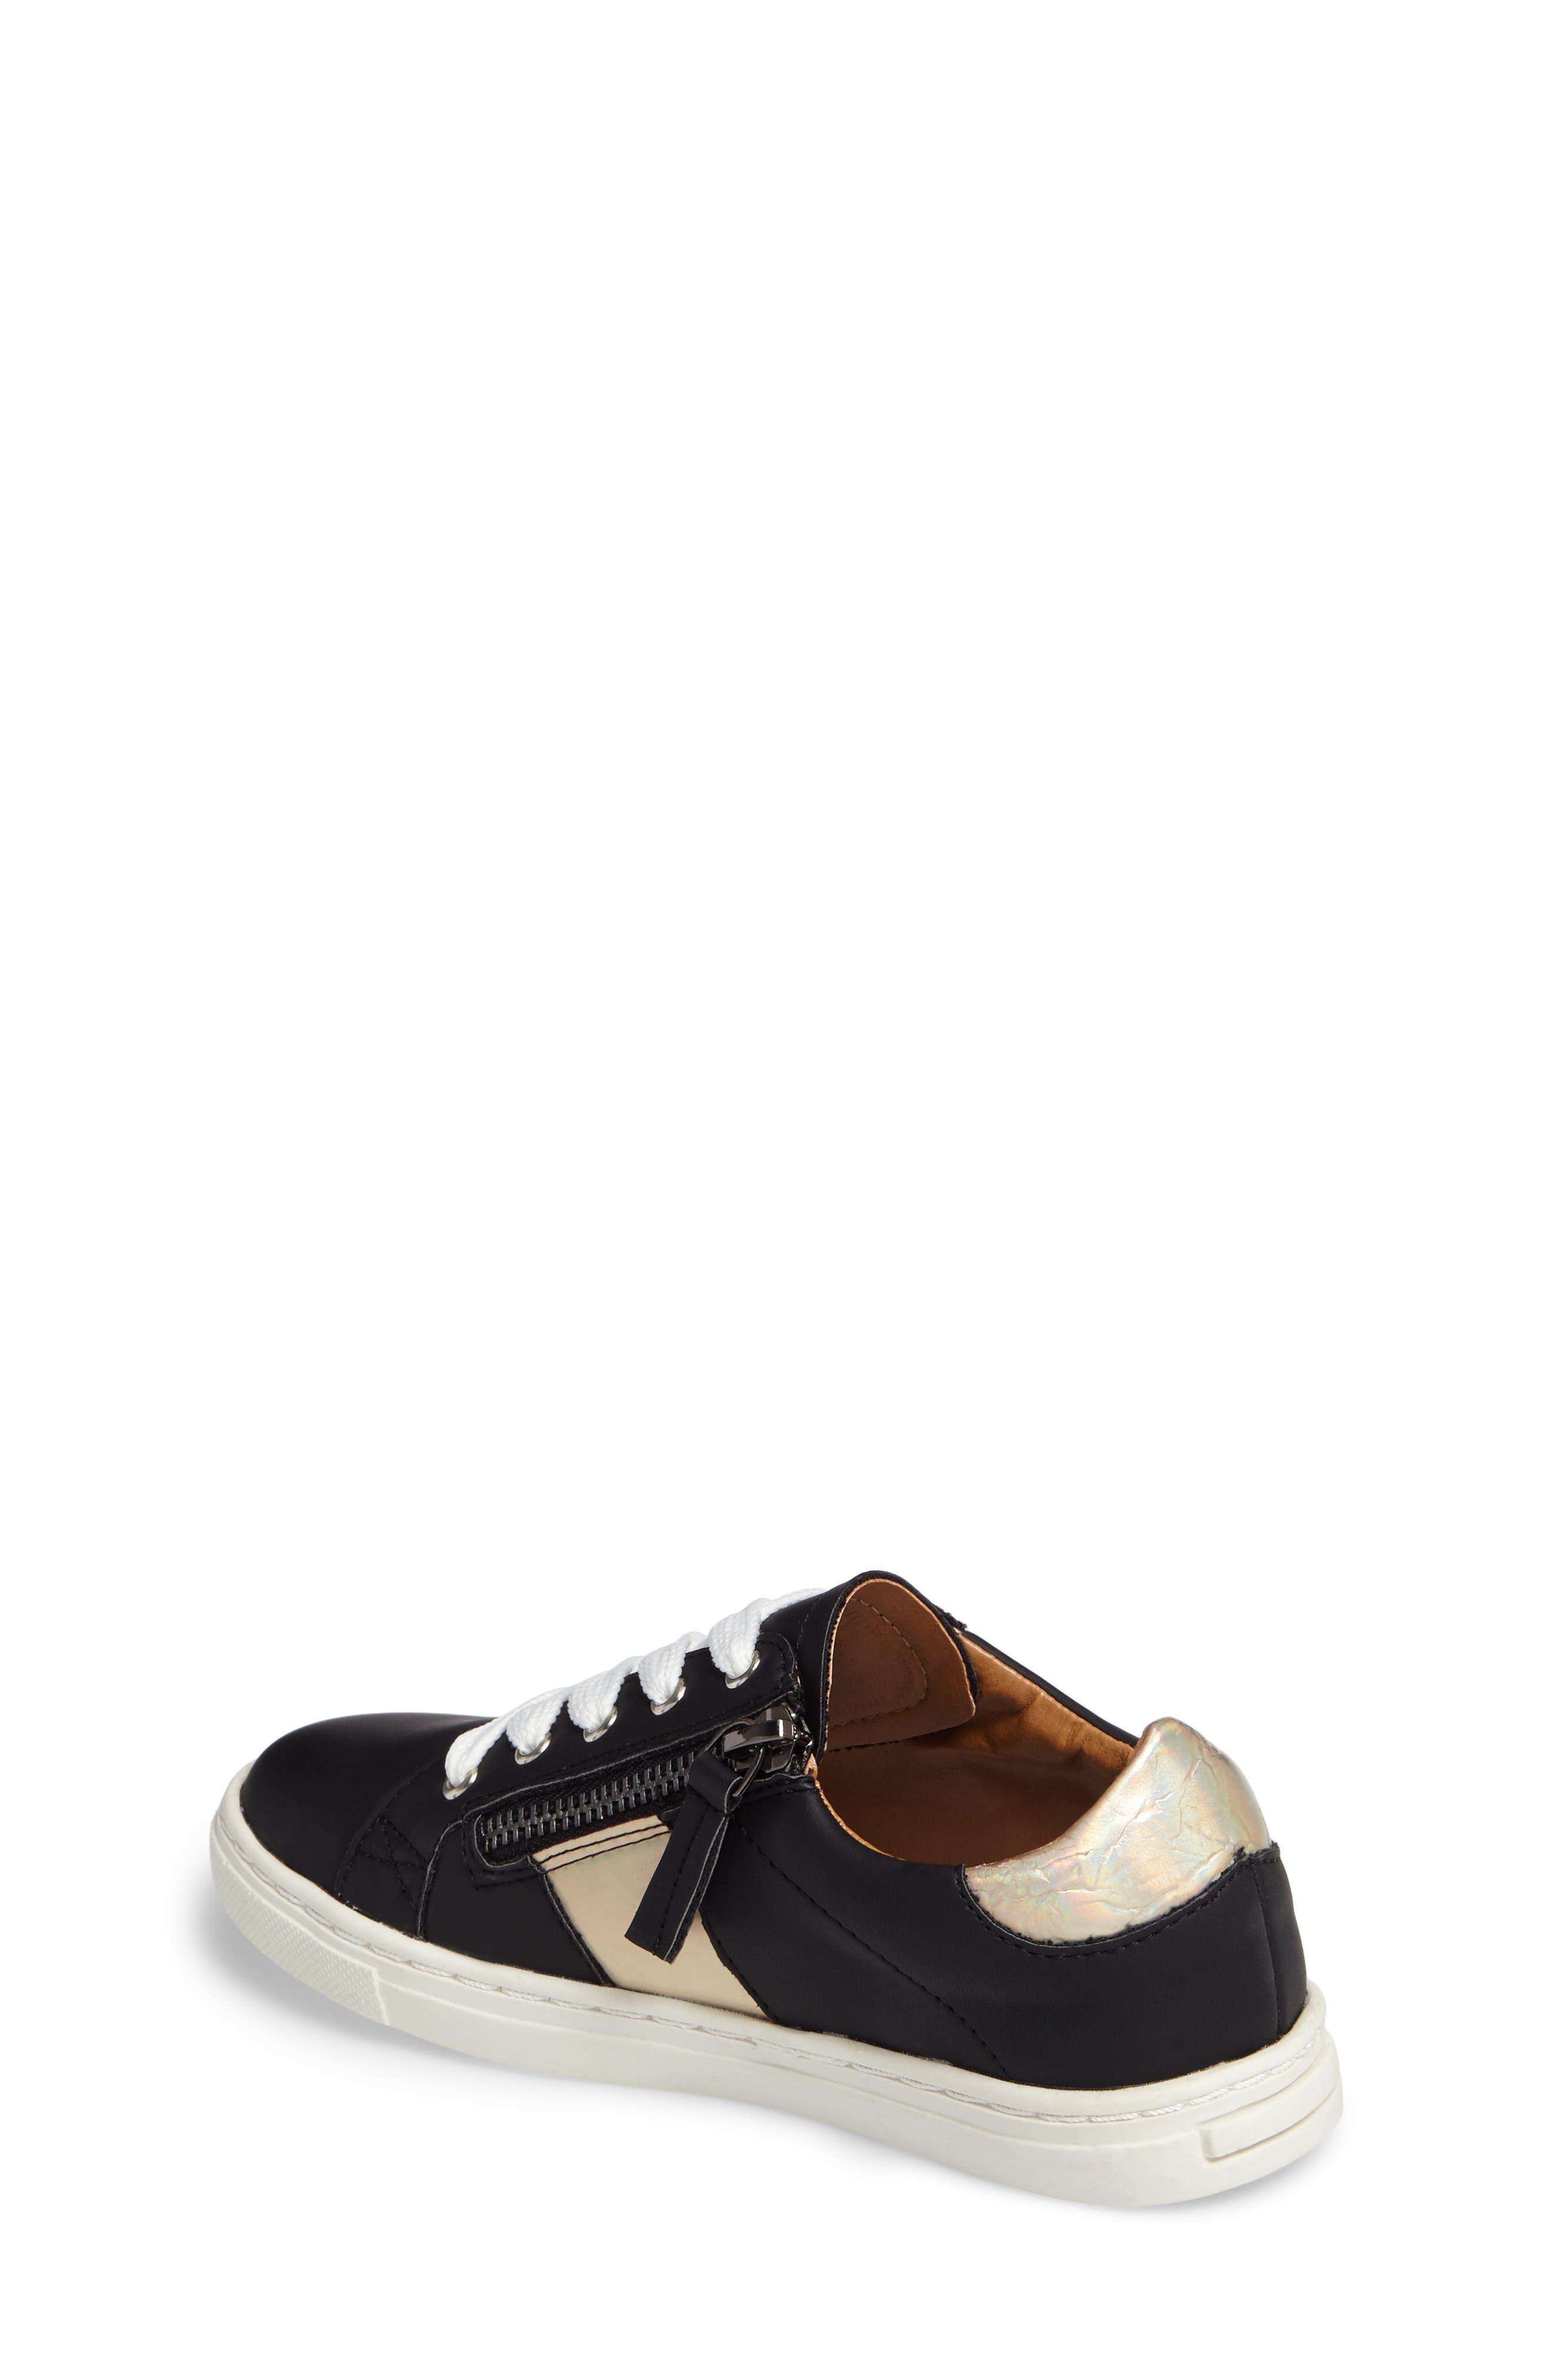 Ziggy Sneaker,                             Alternate thumbnail 2, color,                             001